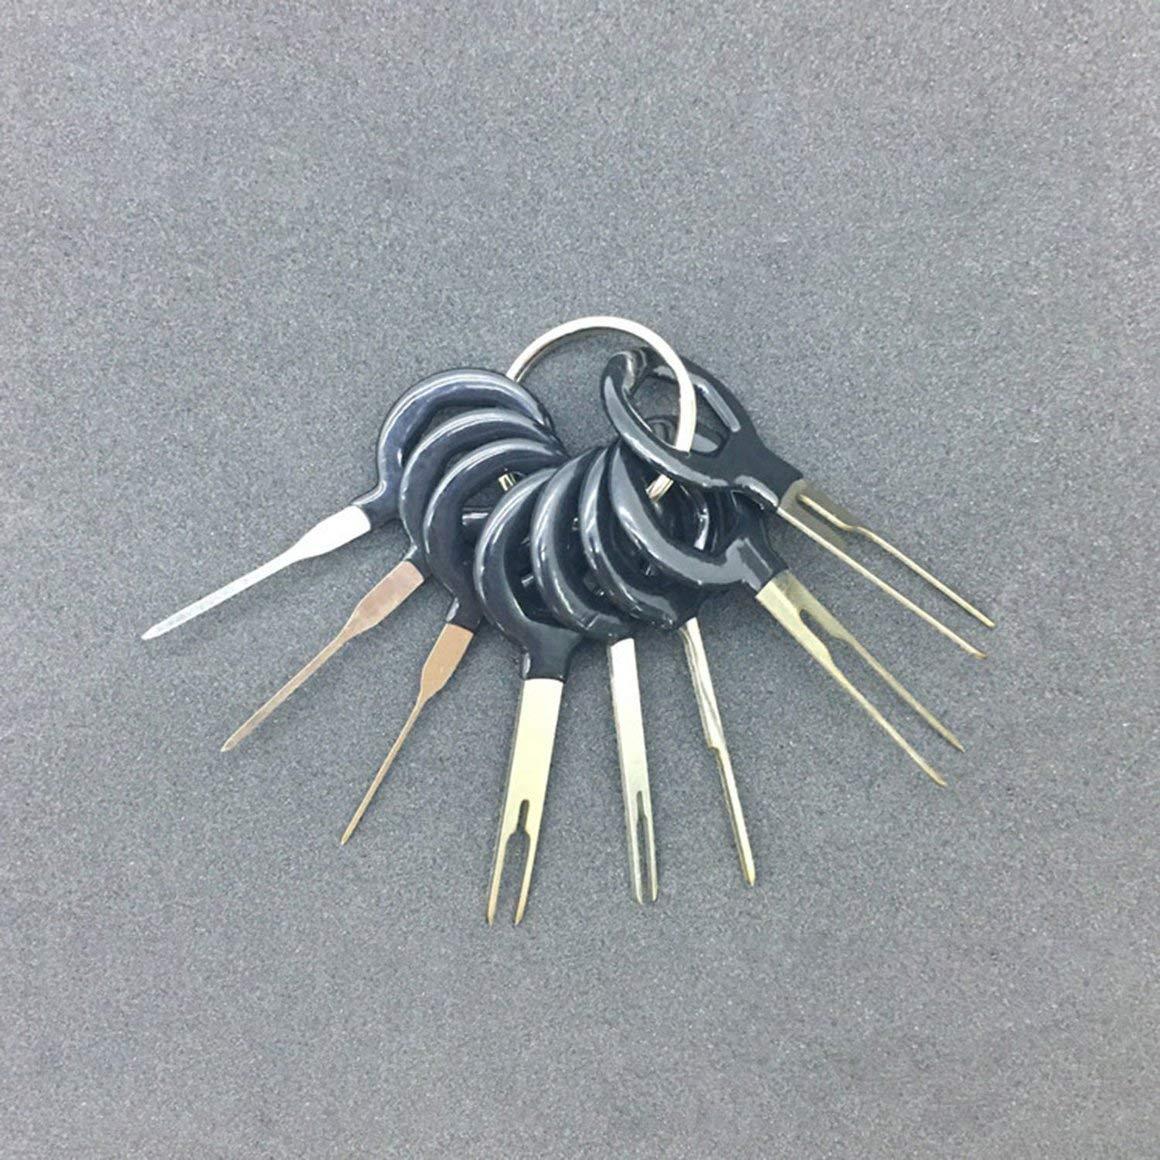 11pcs // set Funnyrunstore Car Terminal Removal Tool Kit Arn/és Cable Crimp Connector Extractor Puller Release Pin Herramientas de Reparaci/ón Profesional